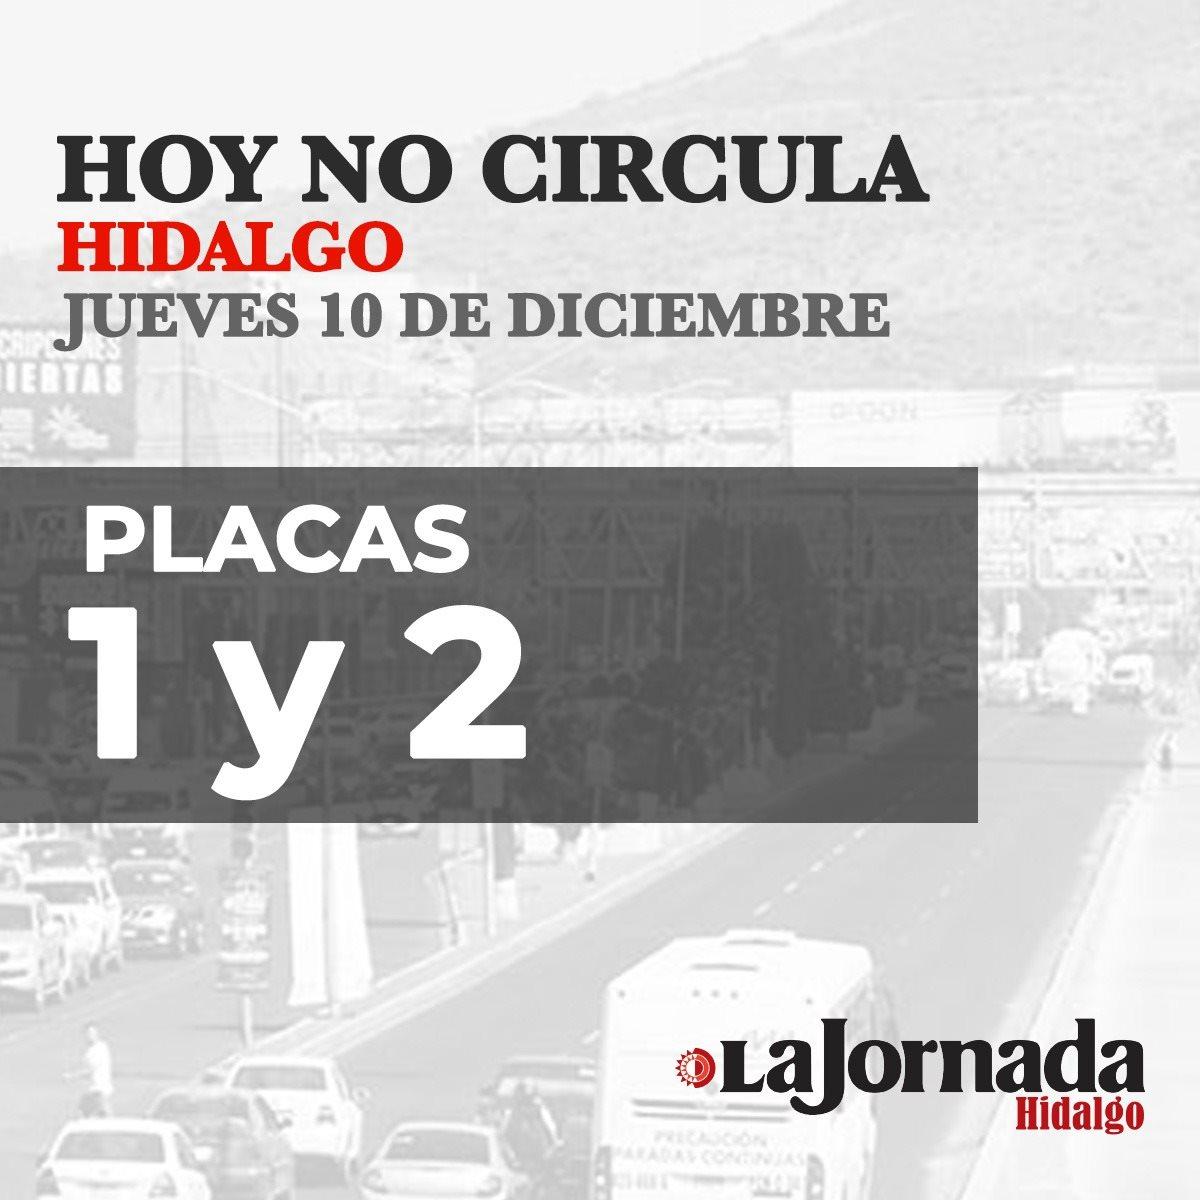 Hoy No Circula Hidalgo 10 diciembre 2020